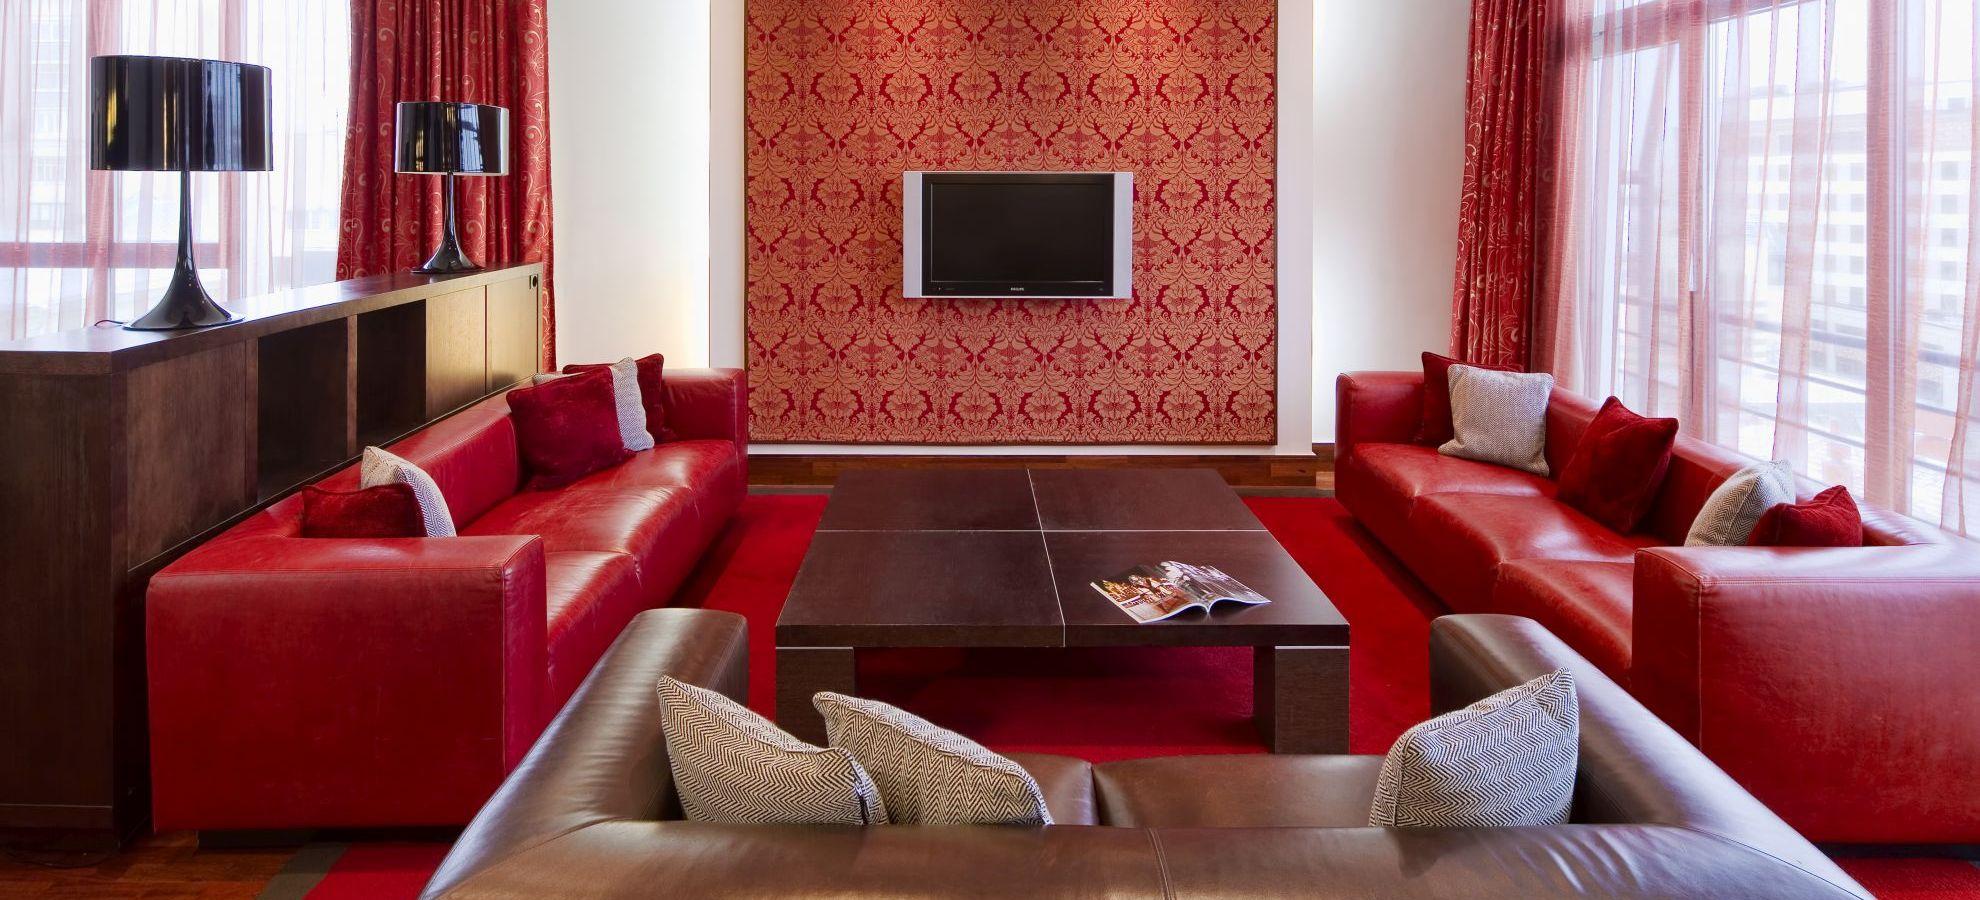 Mamaison-Hotel-Pokrovka-Chairman-Suite.jpg